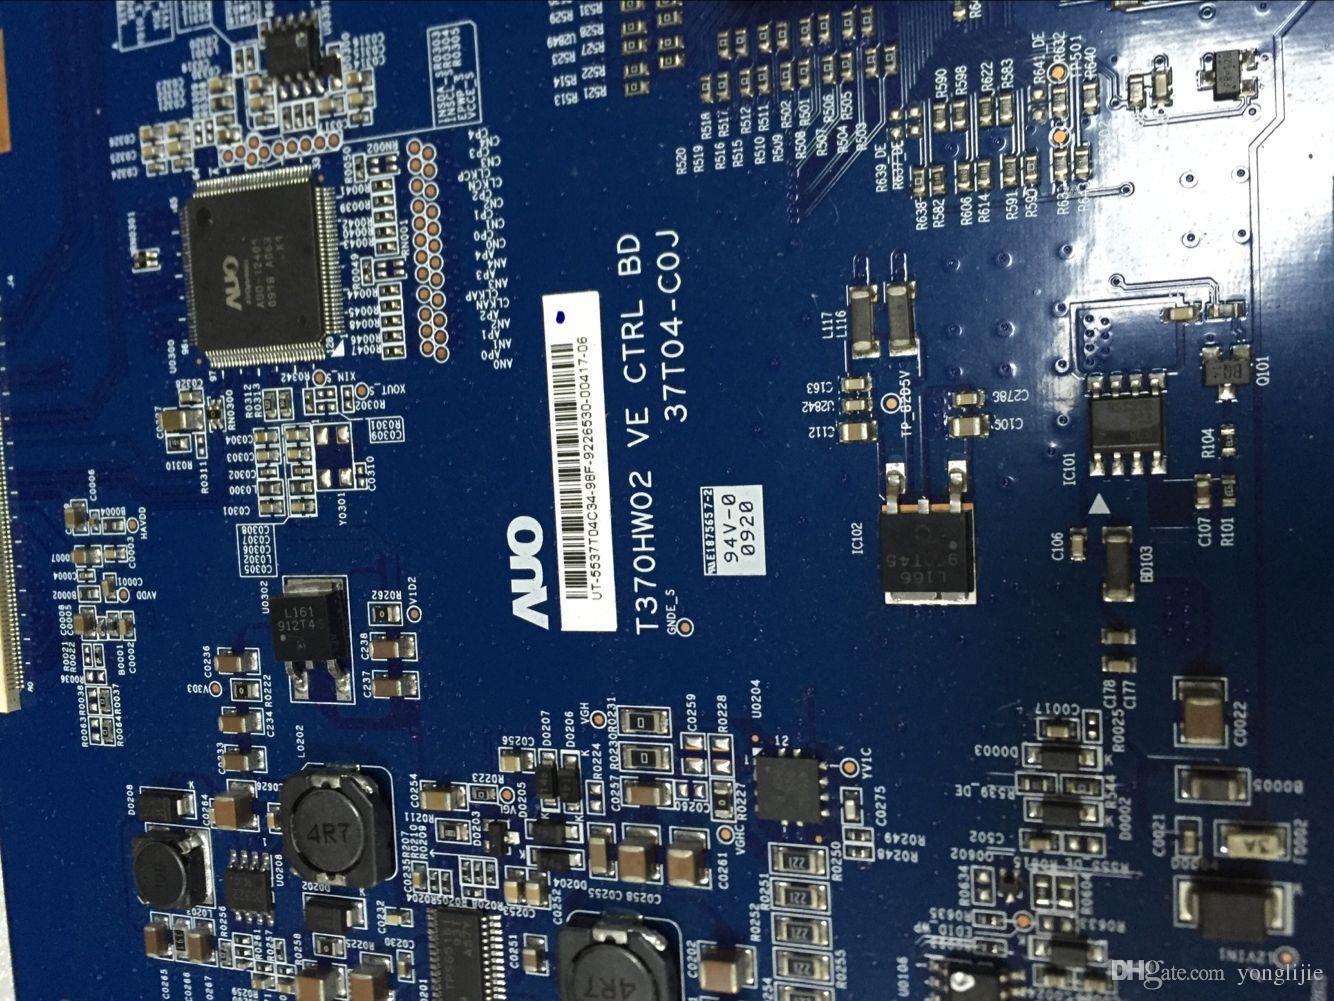 "AUO T-CON Logic Board 37T04-C0J 37T04-COJ T370HW02 Fr 32/"" 37/"" 40/"" 46/"" TV Display"